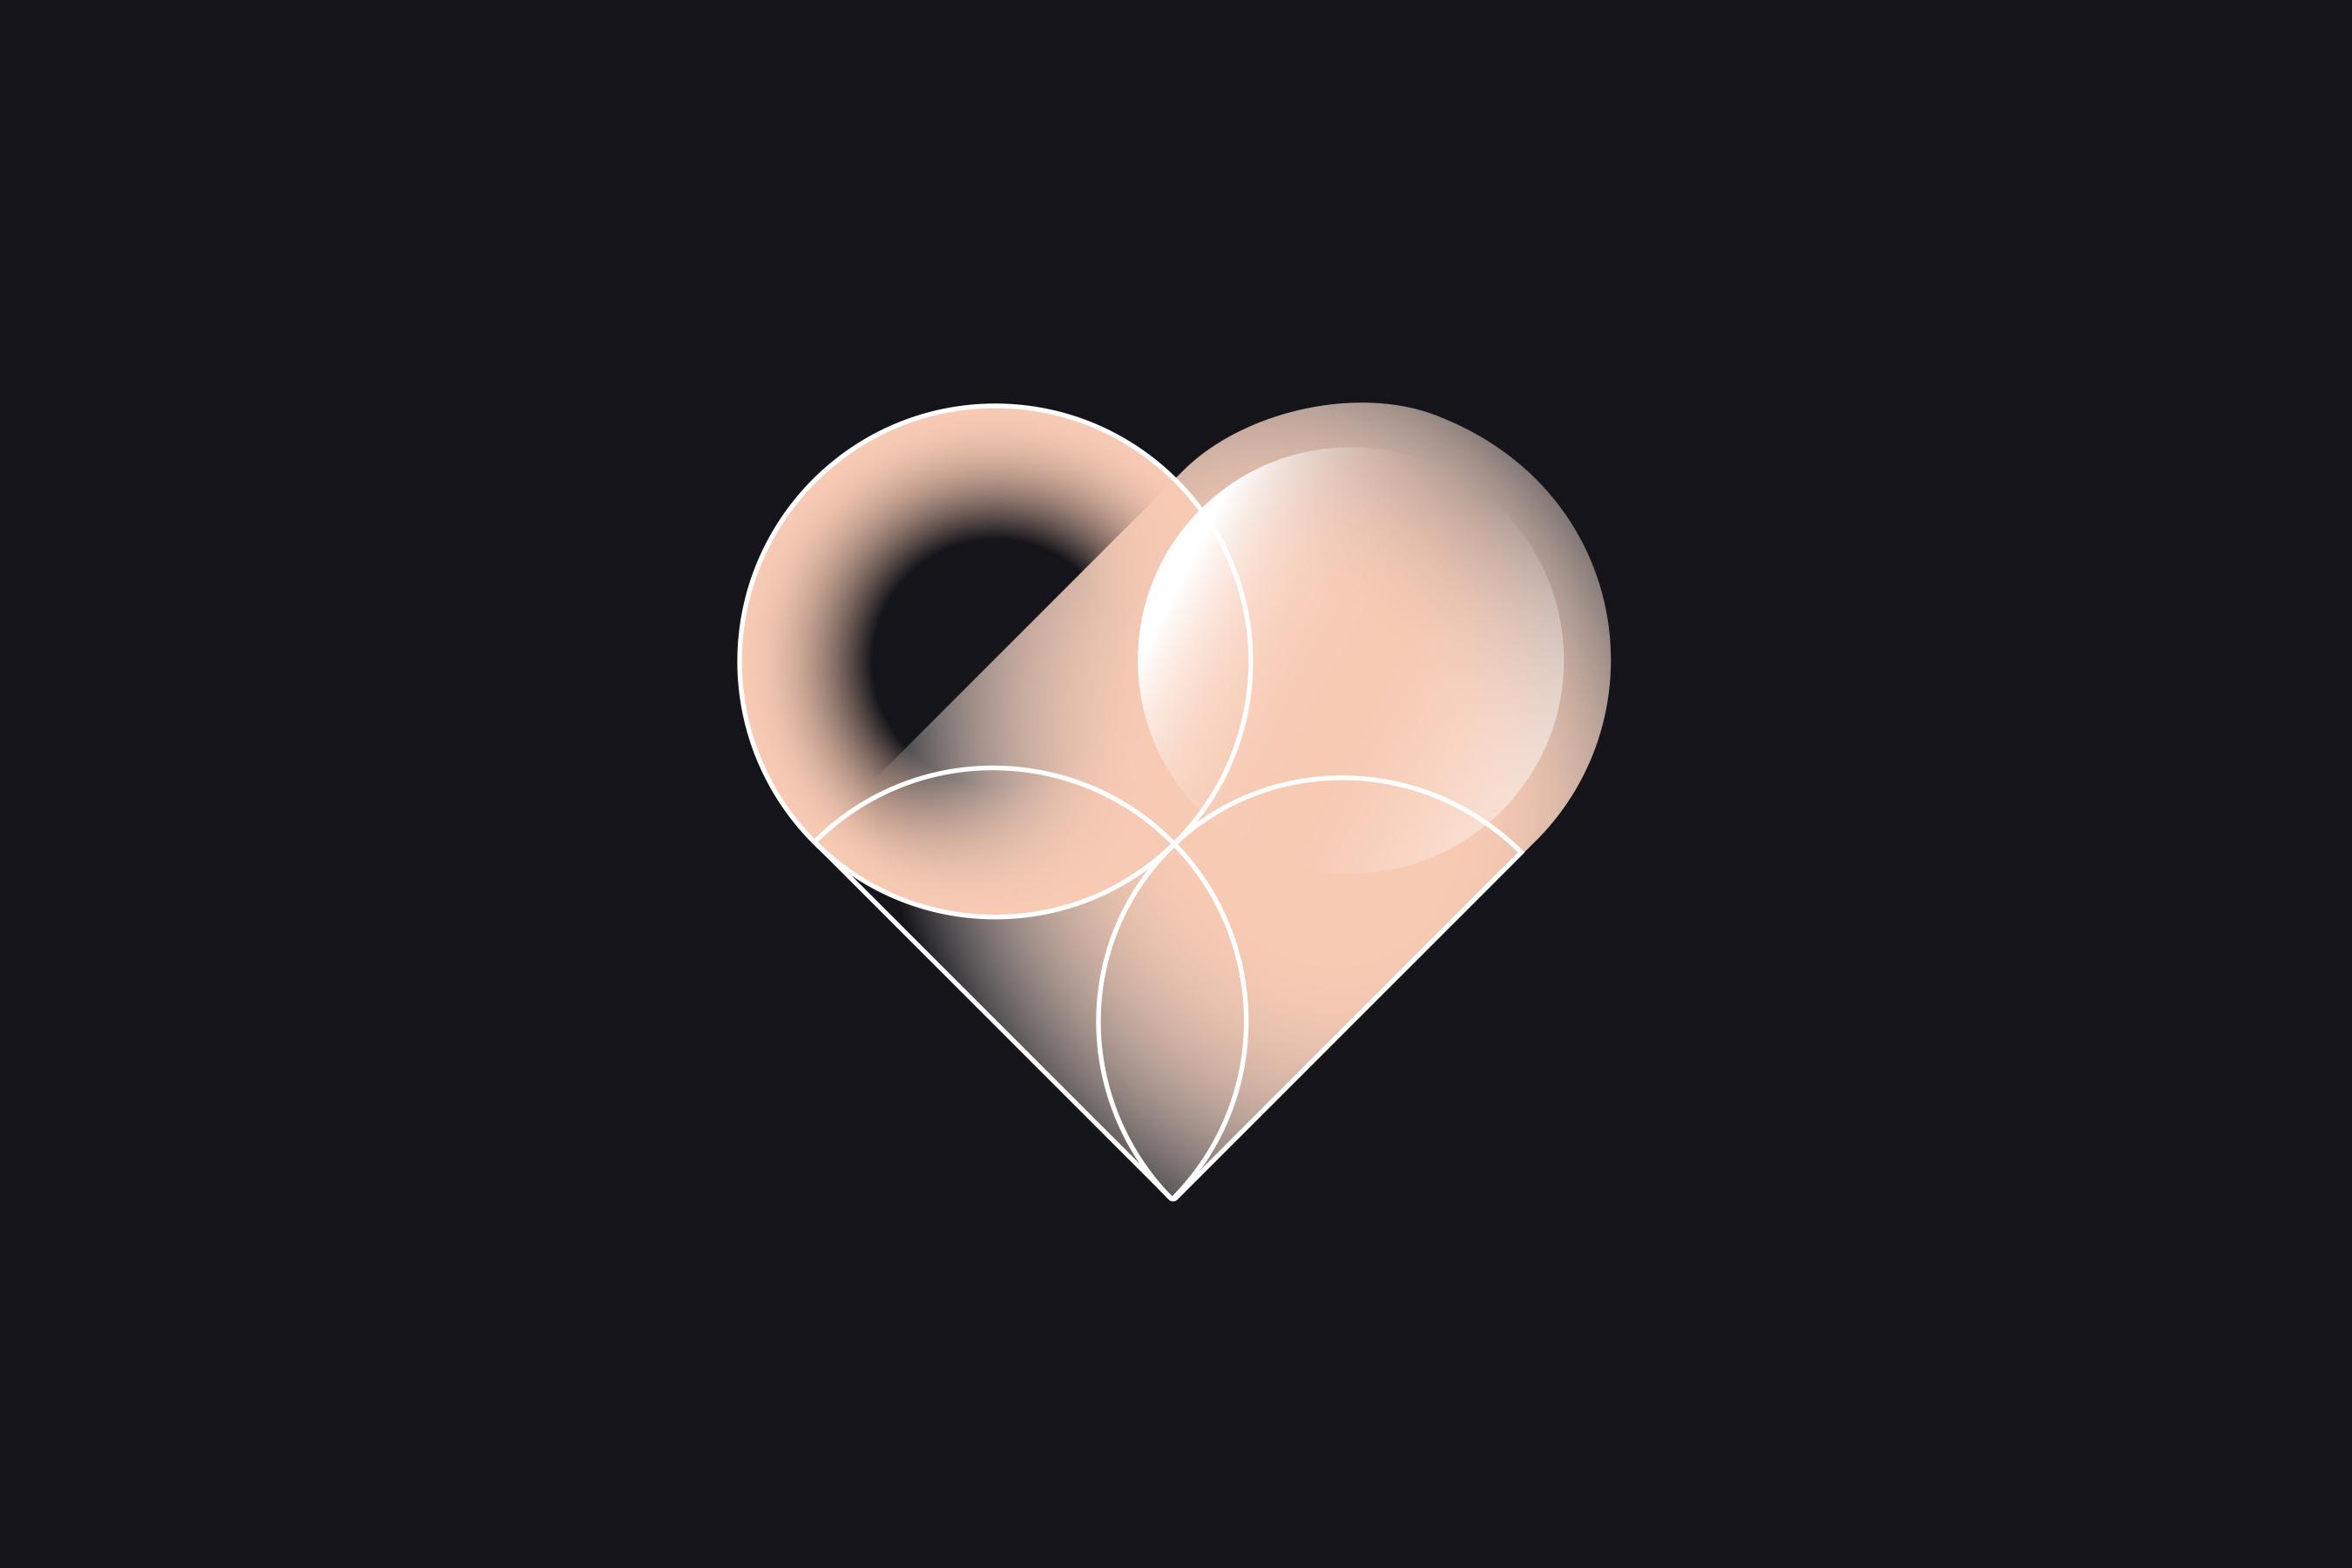 dr_bohm_heart_illu